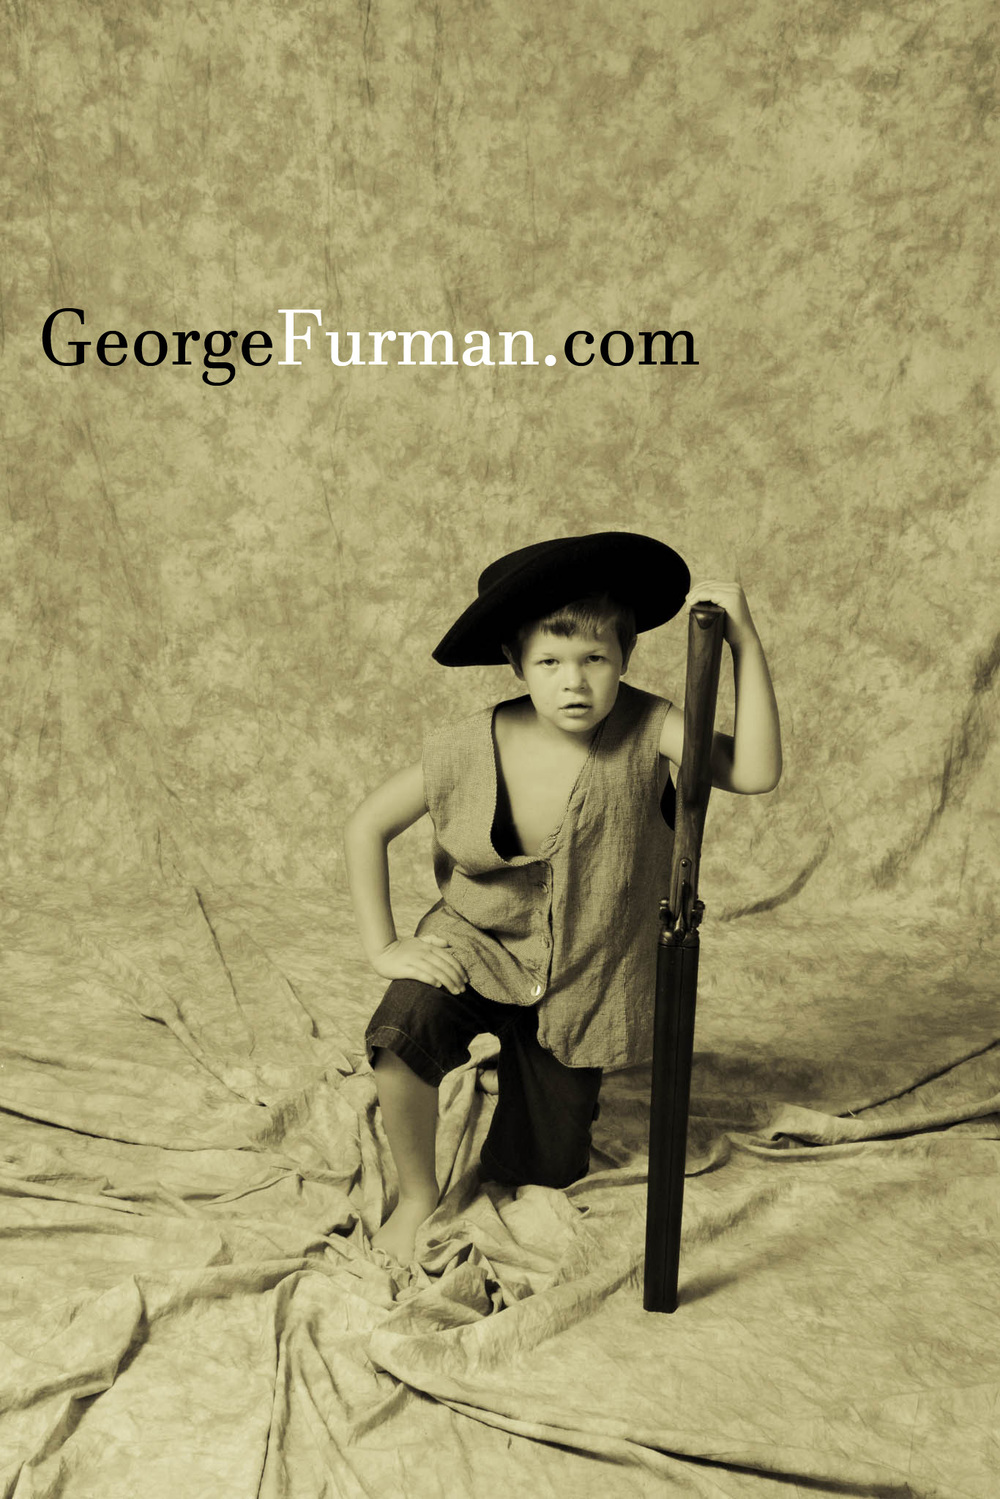 Furman Fantastic (17).JPG